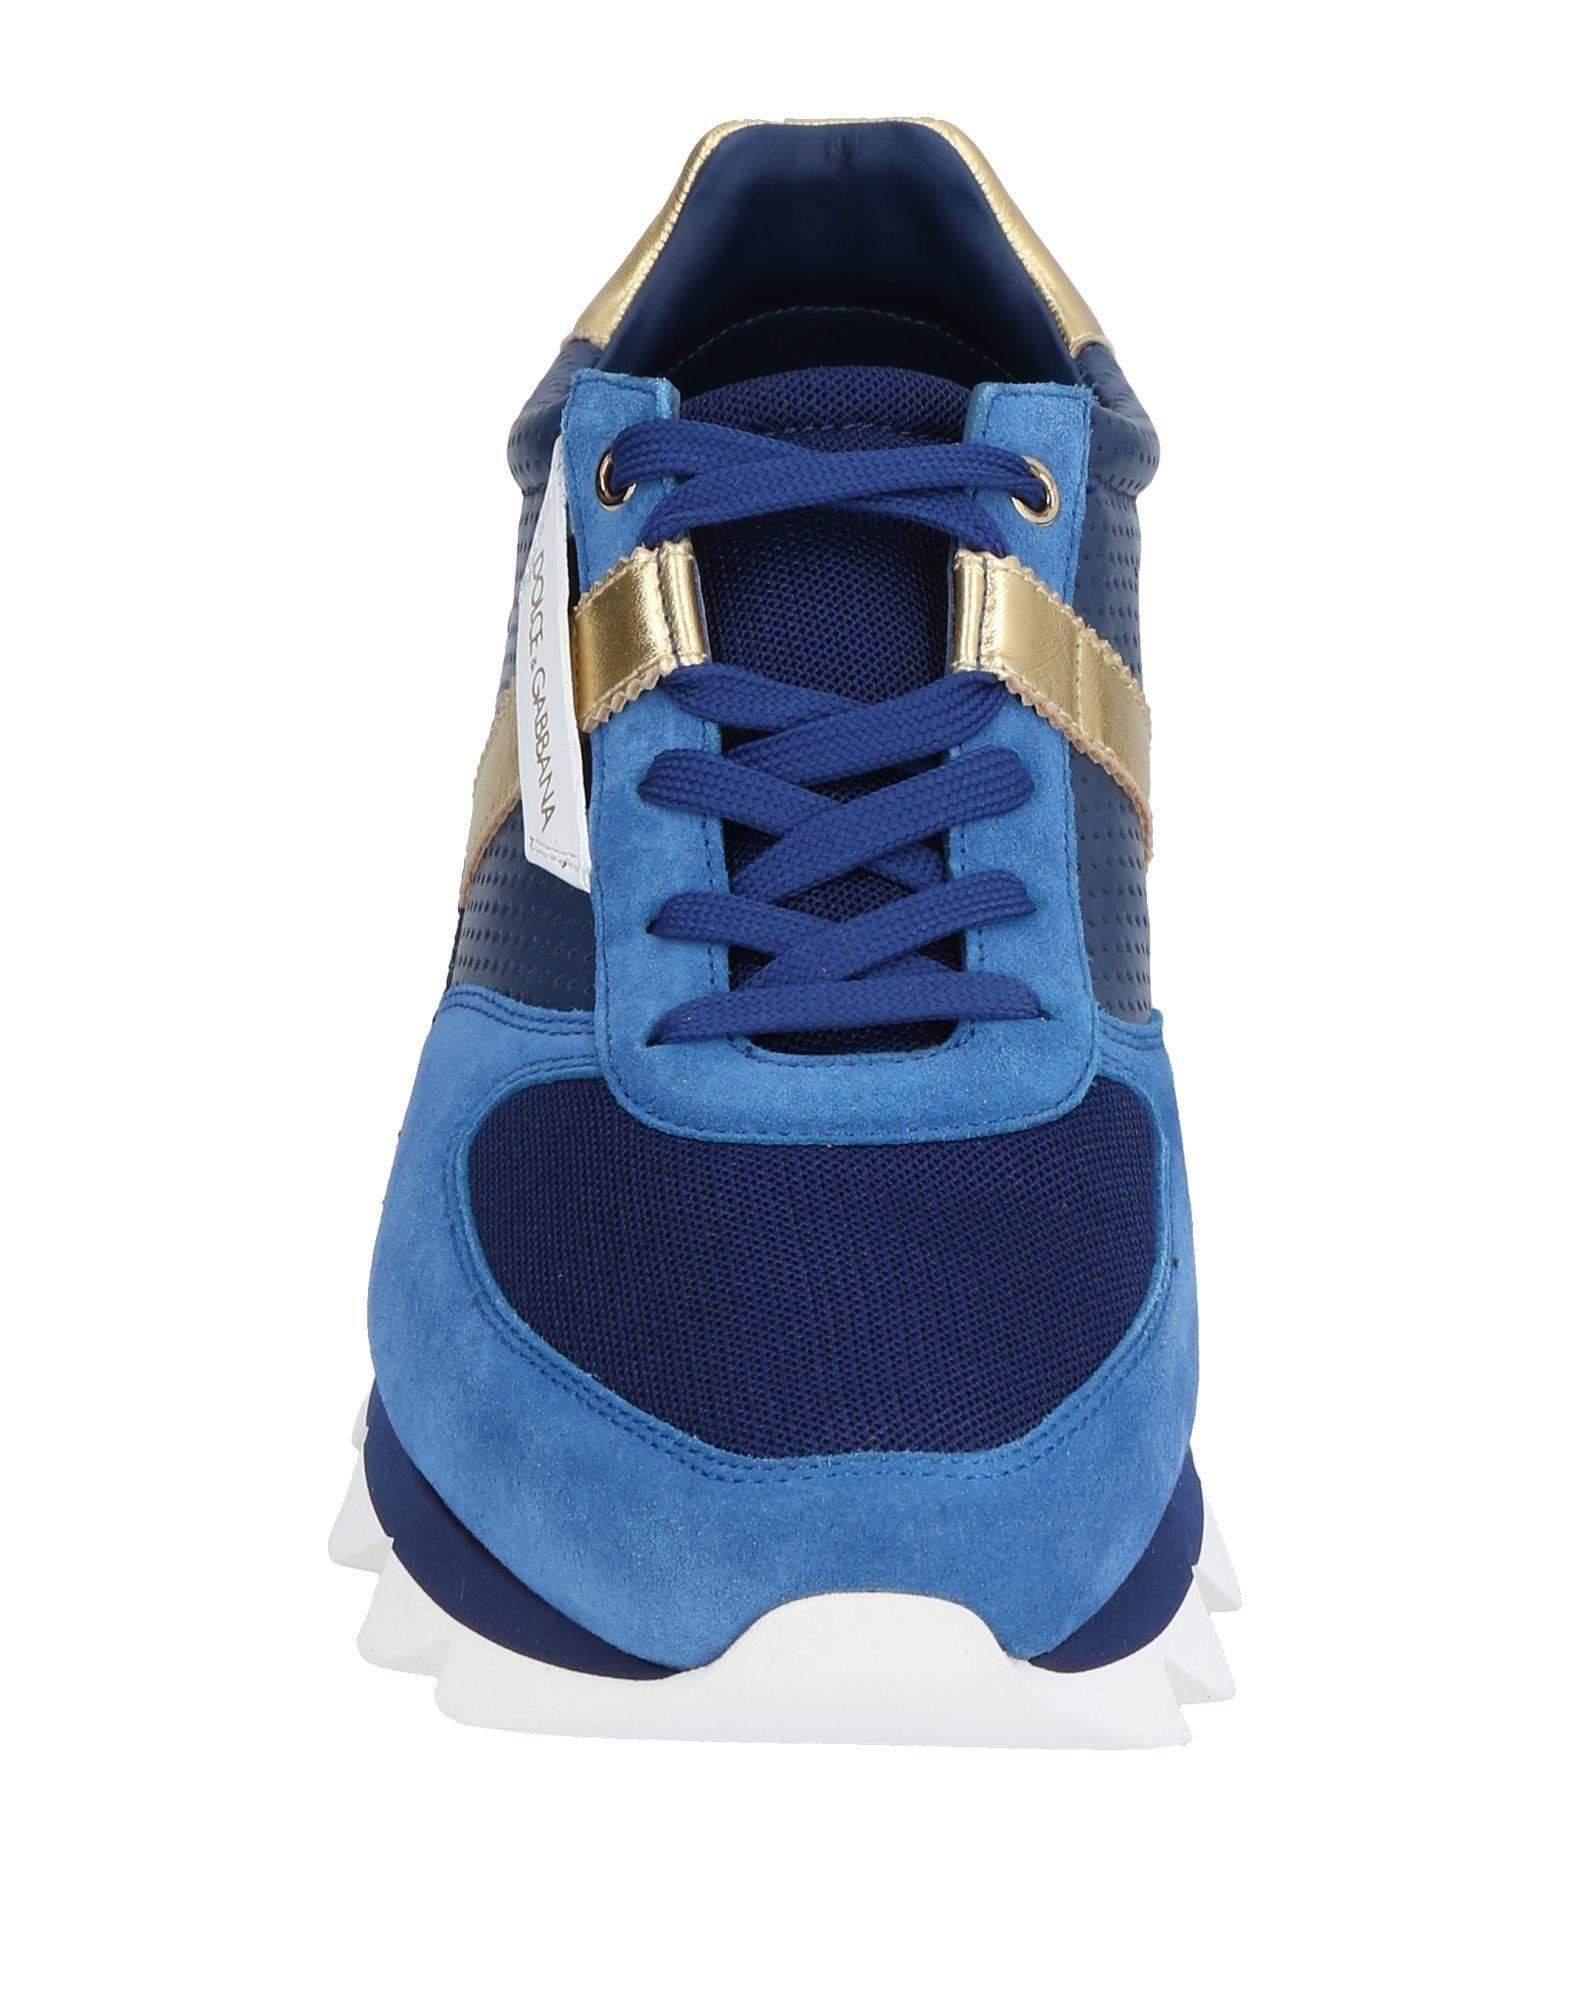 Dolce & Gabbana Sneakers Herren beliebte  11470895RG Gute Qualität beliebte Herren Schuhe b0133c